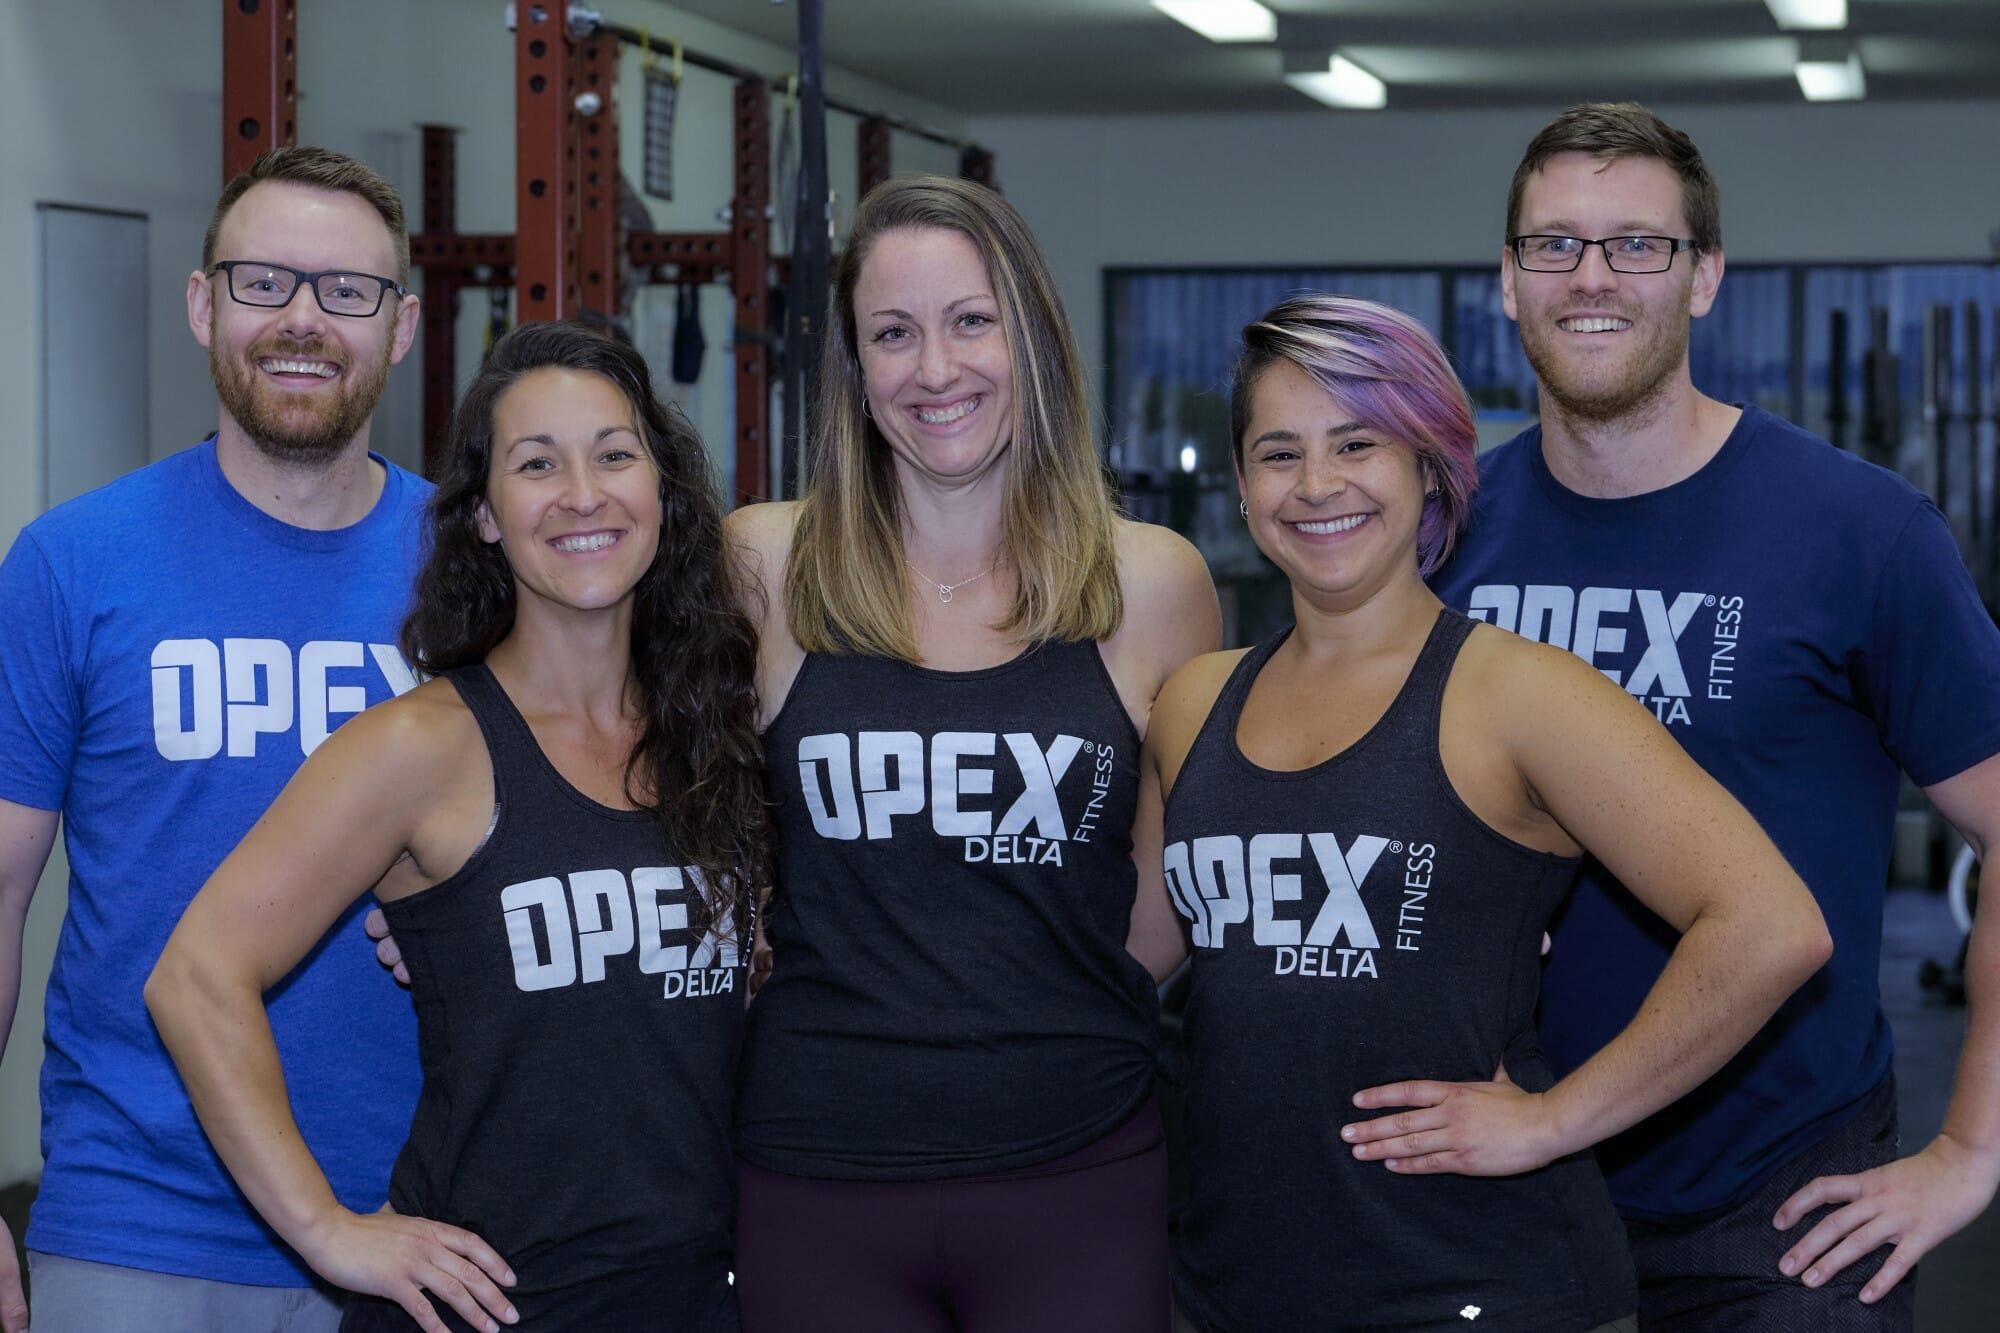 OPEX Delta Free Consult